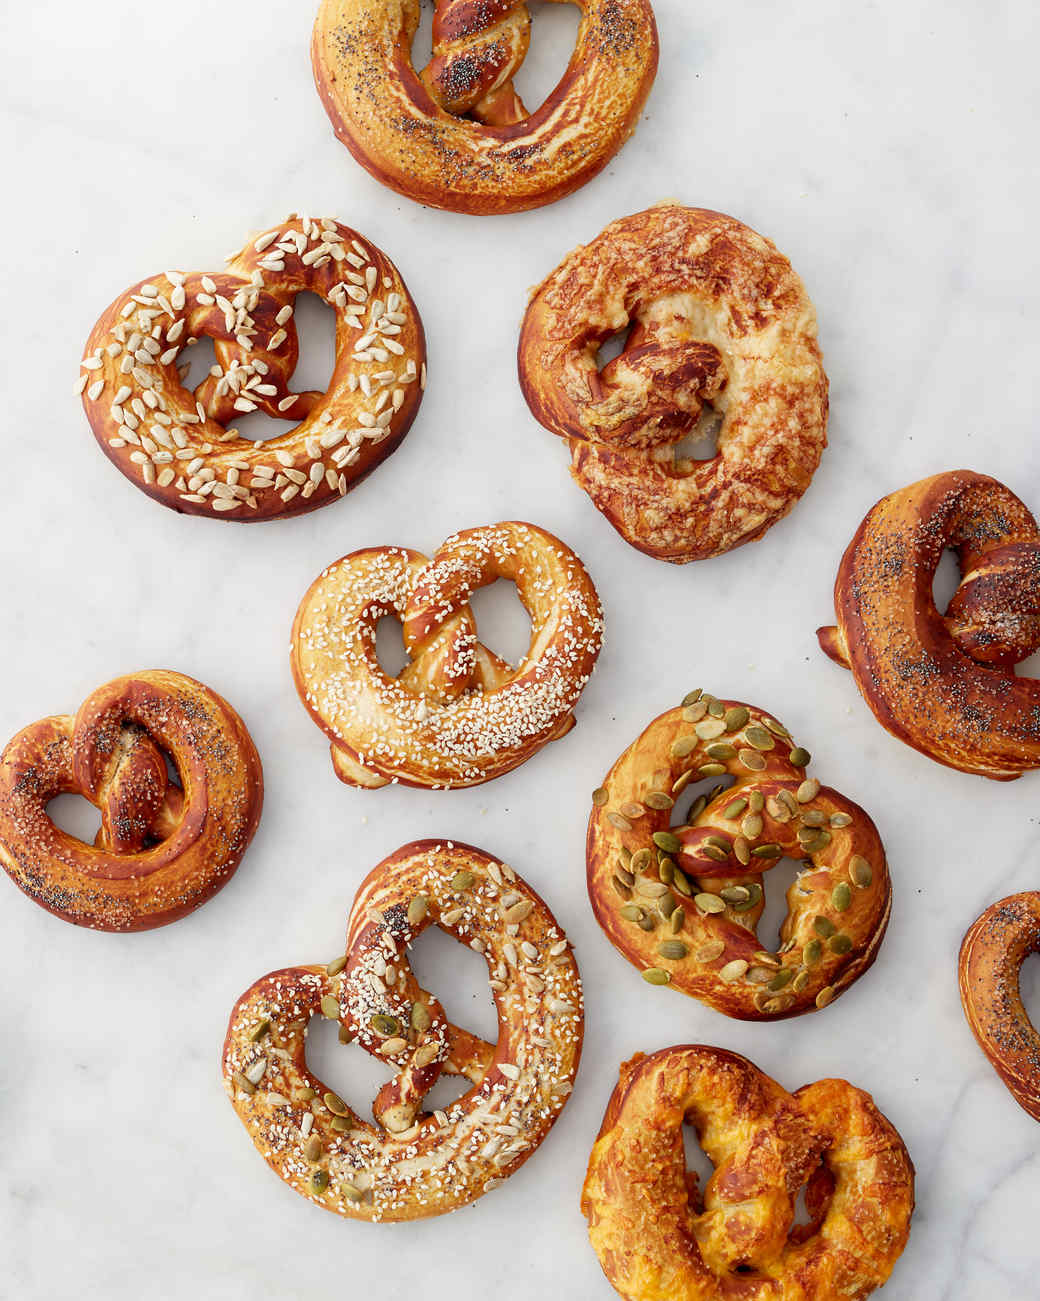 Lina kulchinsky's soft pretzels